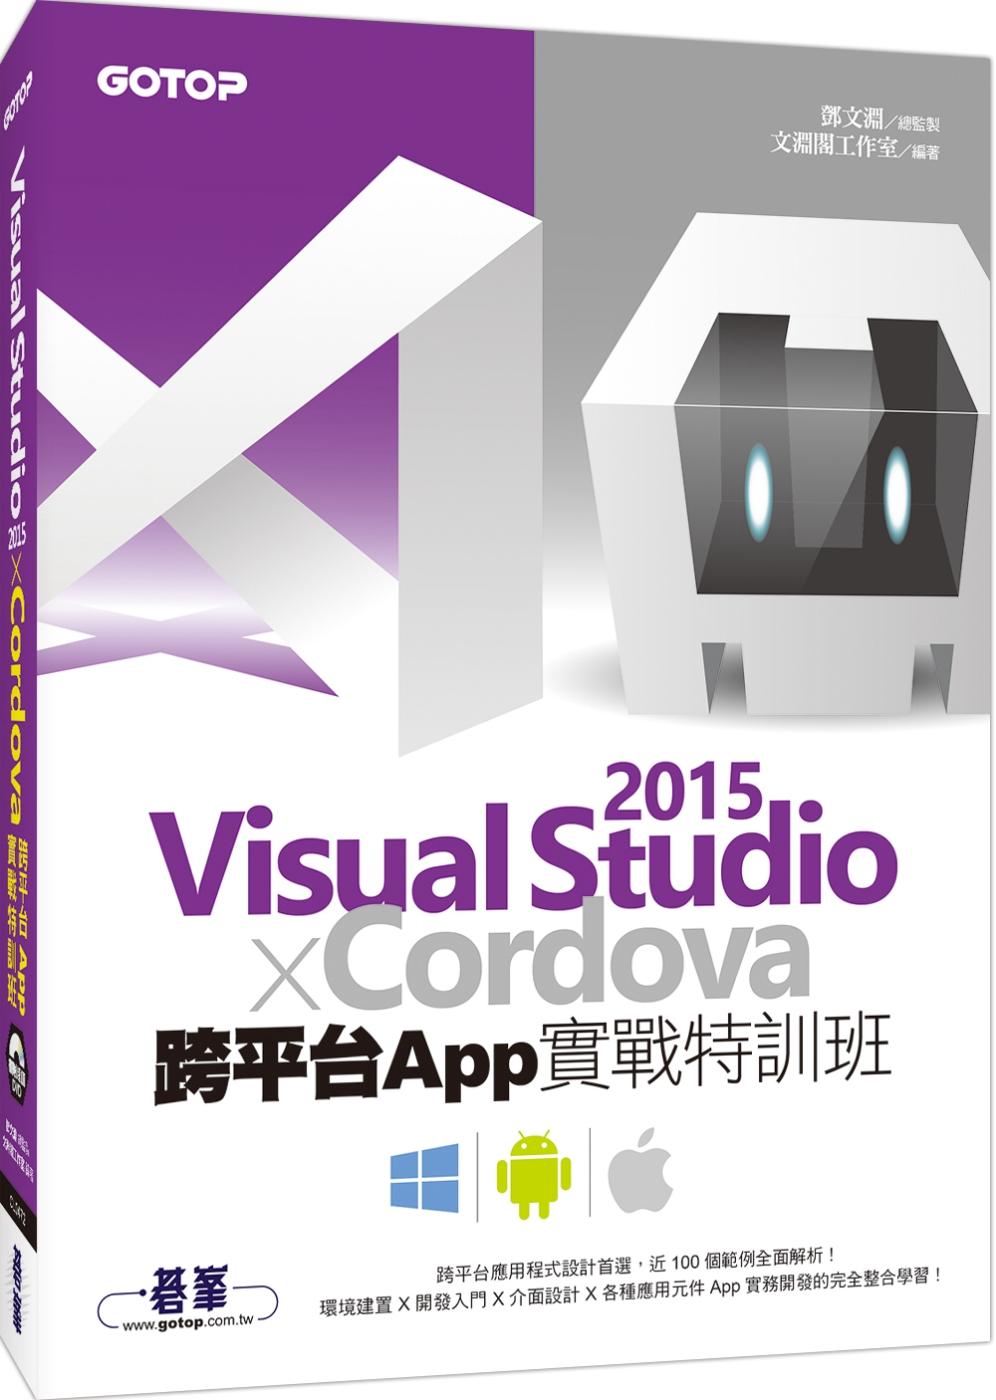 Visual Studio 2015 X Cordova跨平台App實戰特訓班(附近120分鐘關鍵影音教學/全書範例程式)